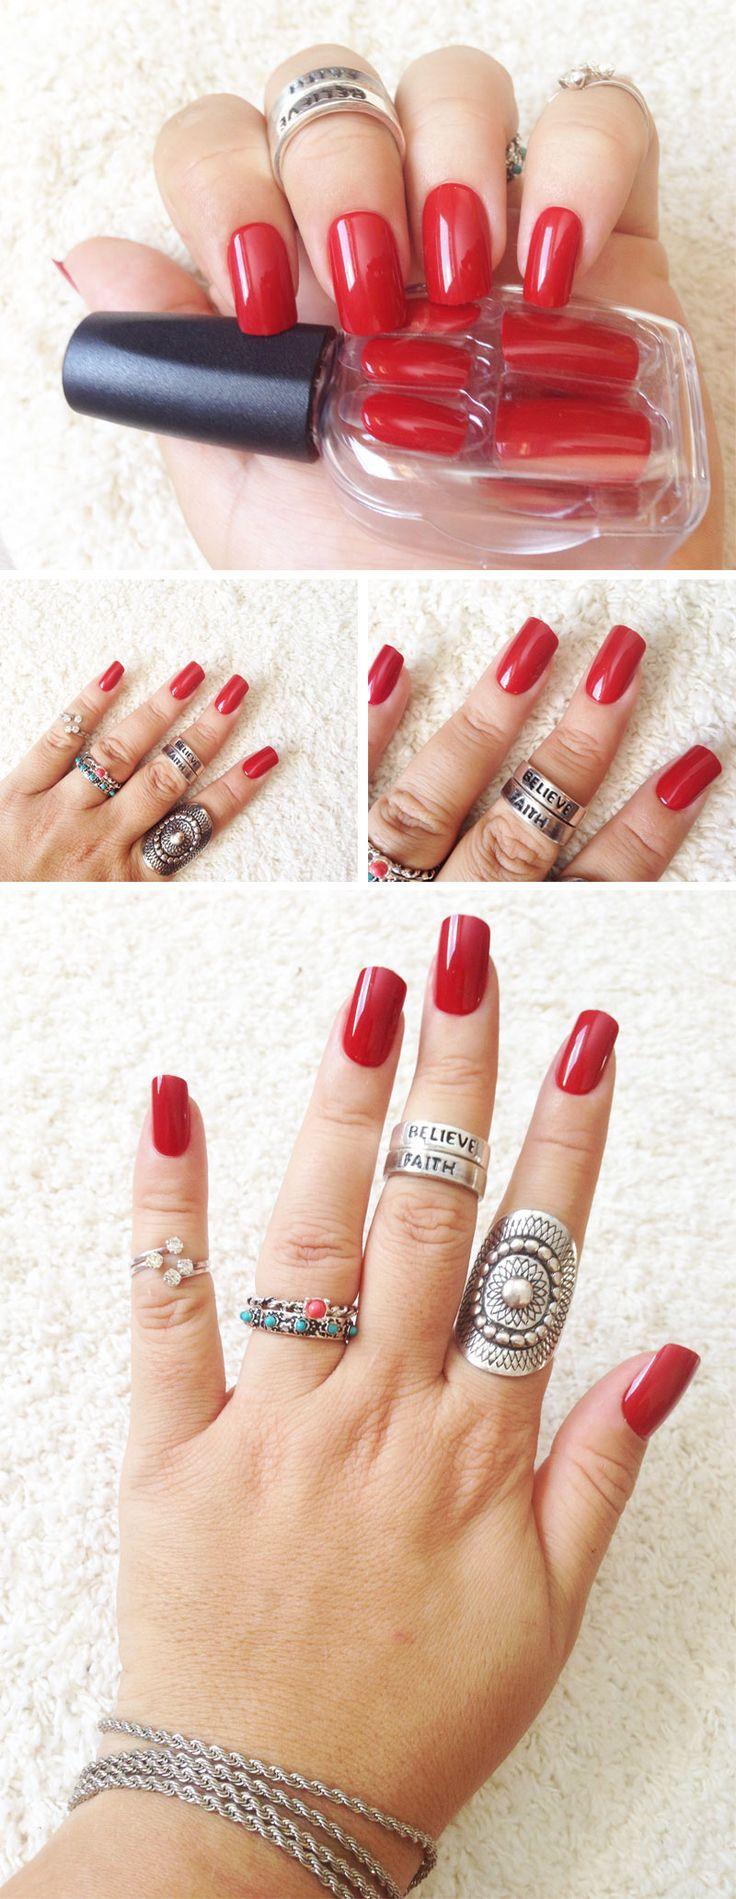 Impress press on manicure nails my style pinterest - Unhas Autocolantes Impress